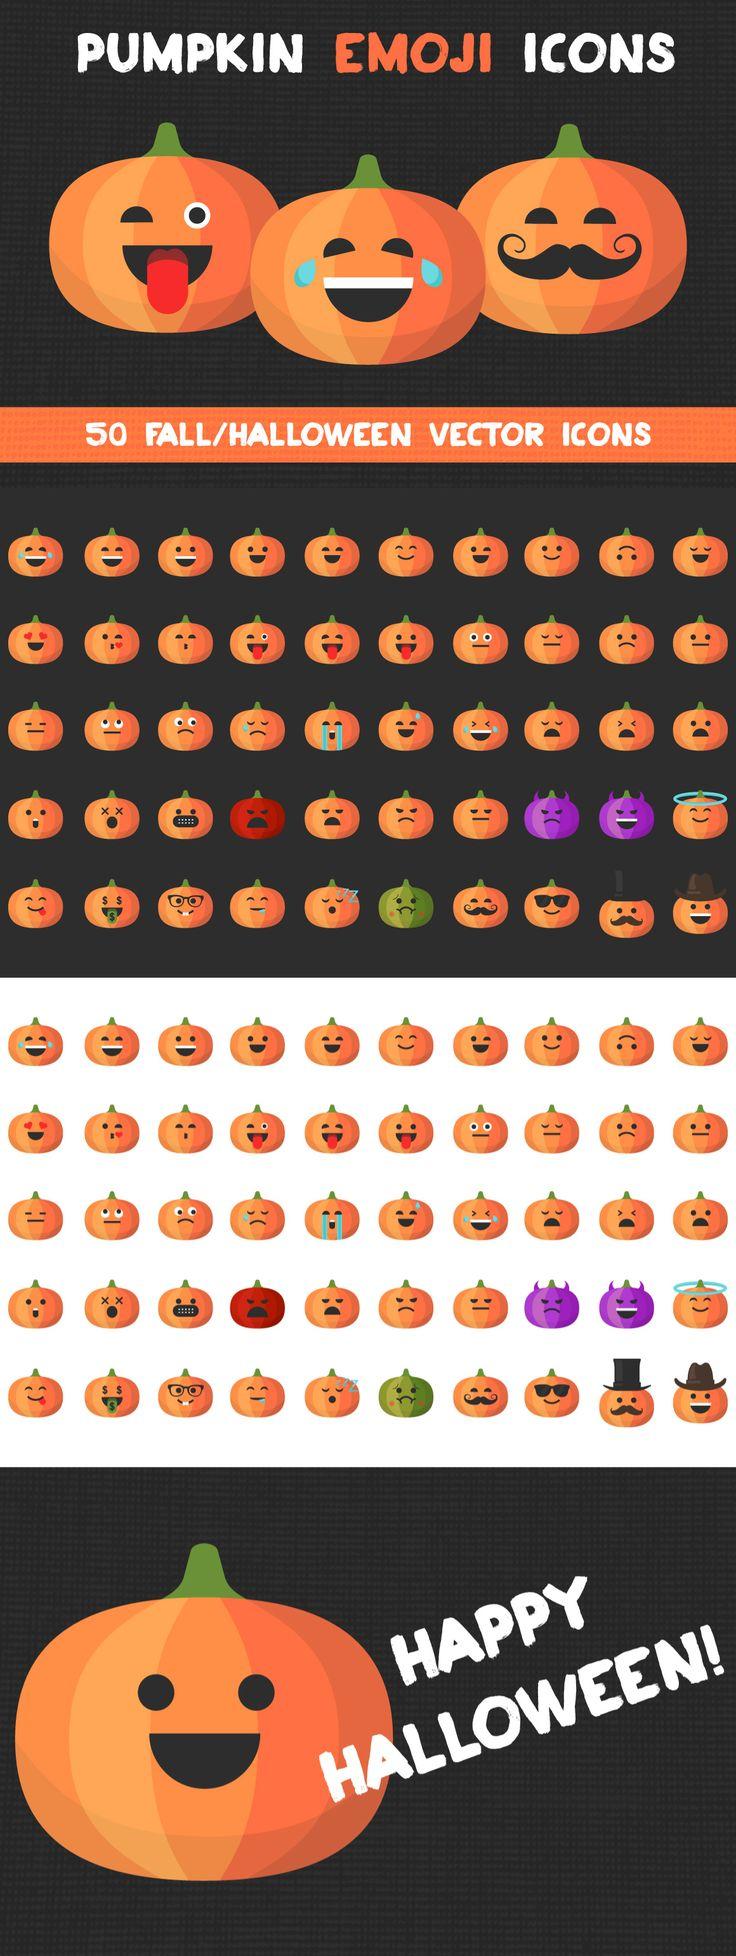 PUMPKIN EMOJI ICONS Set of 50 fall/halloween vector